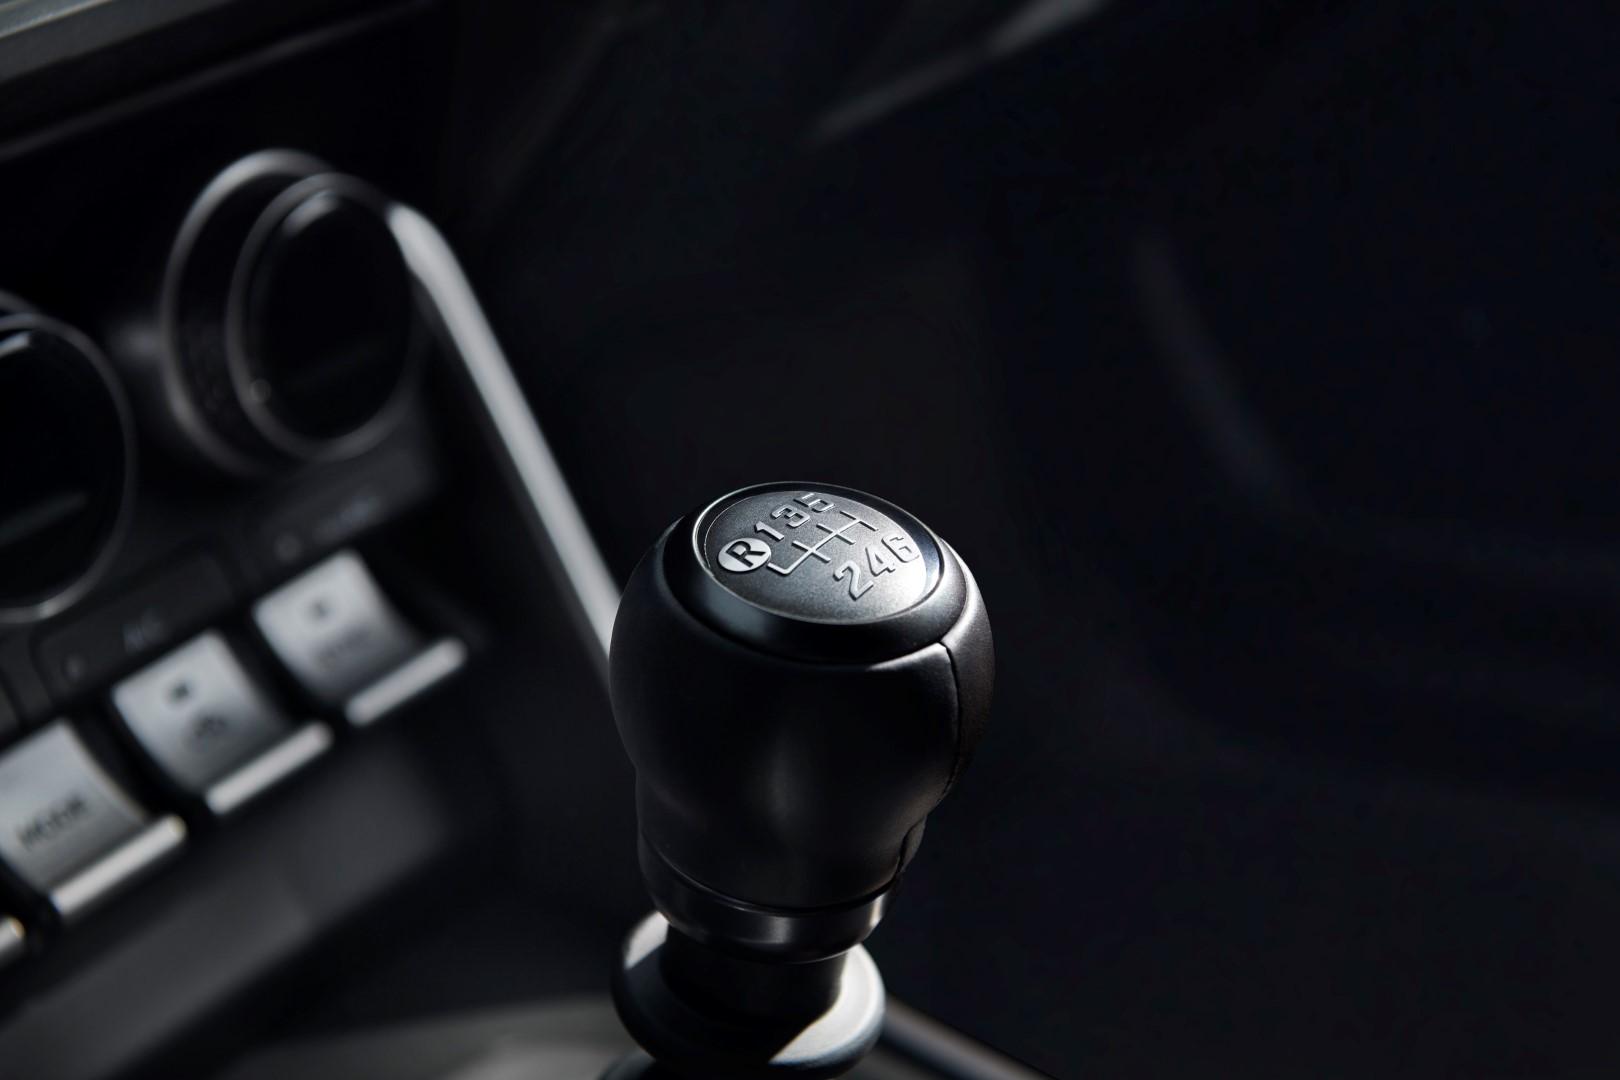 2020 Subaru BRZ gear